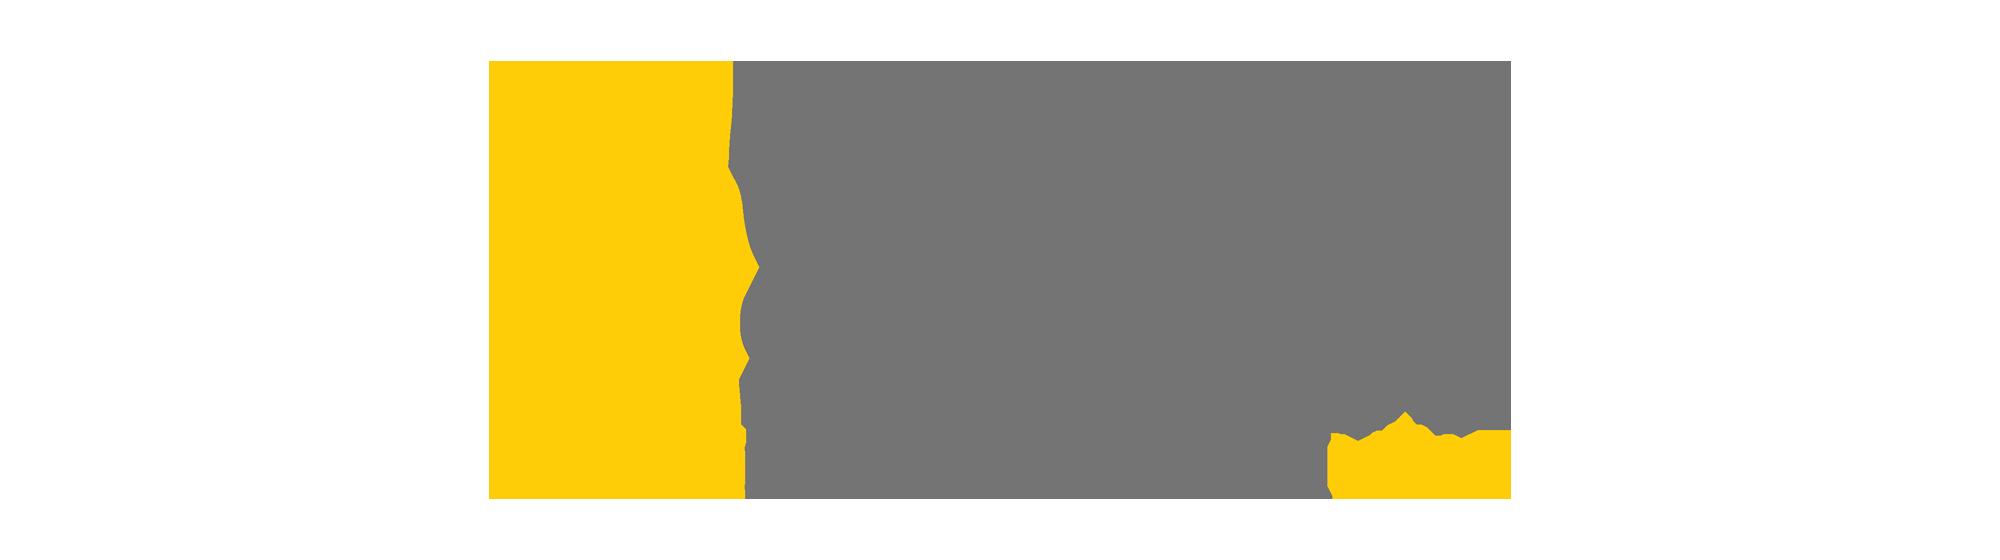 cs4ca-latam-2019-logo